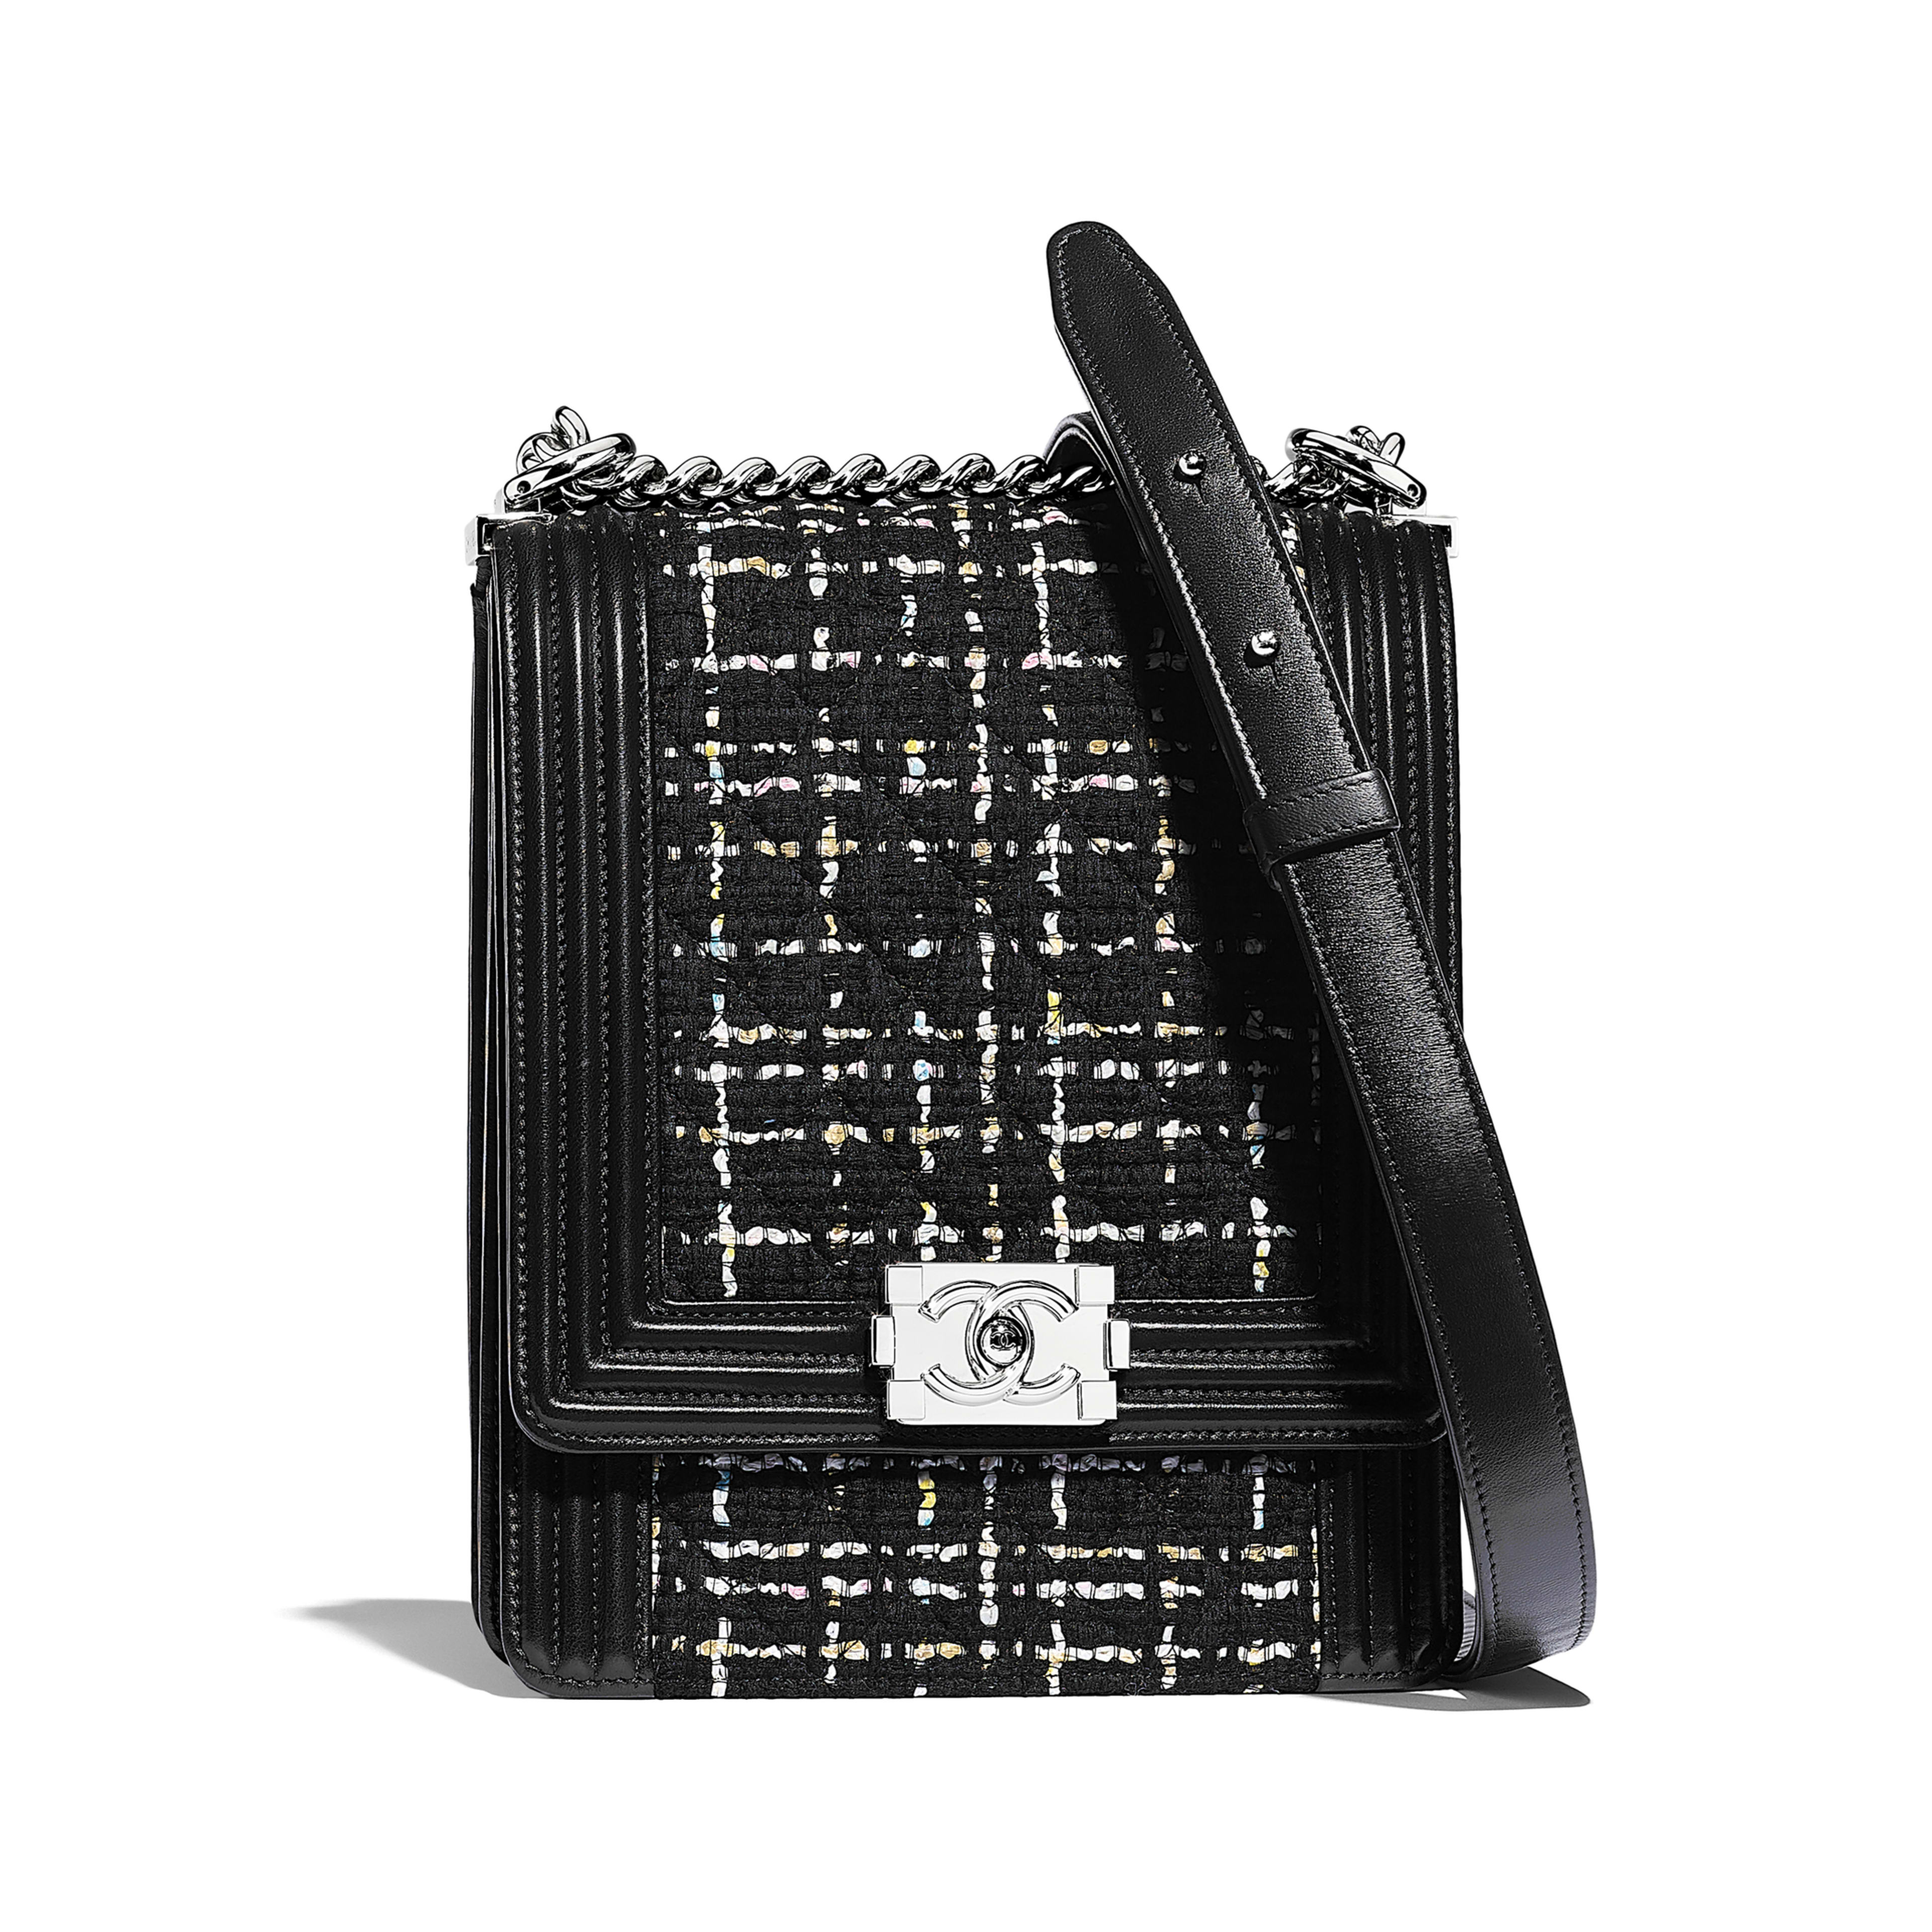 f4117096319b00 Boy Chanel Handbag Tweed Calfskin Silver Tone Metal Black